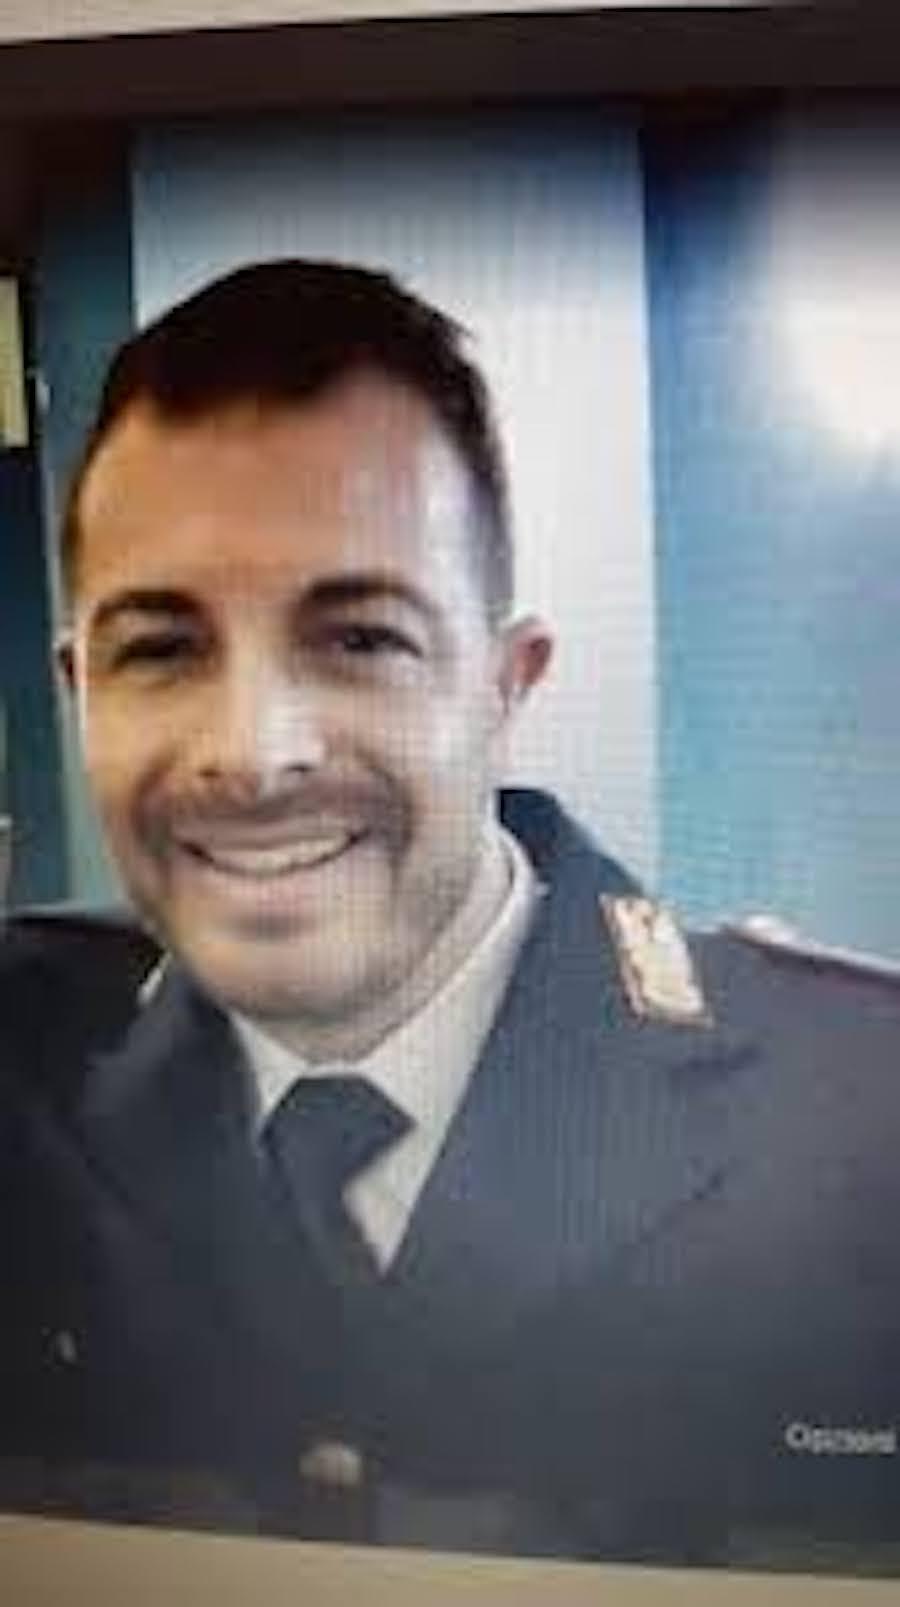 Matteo Demenego